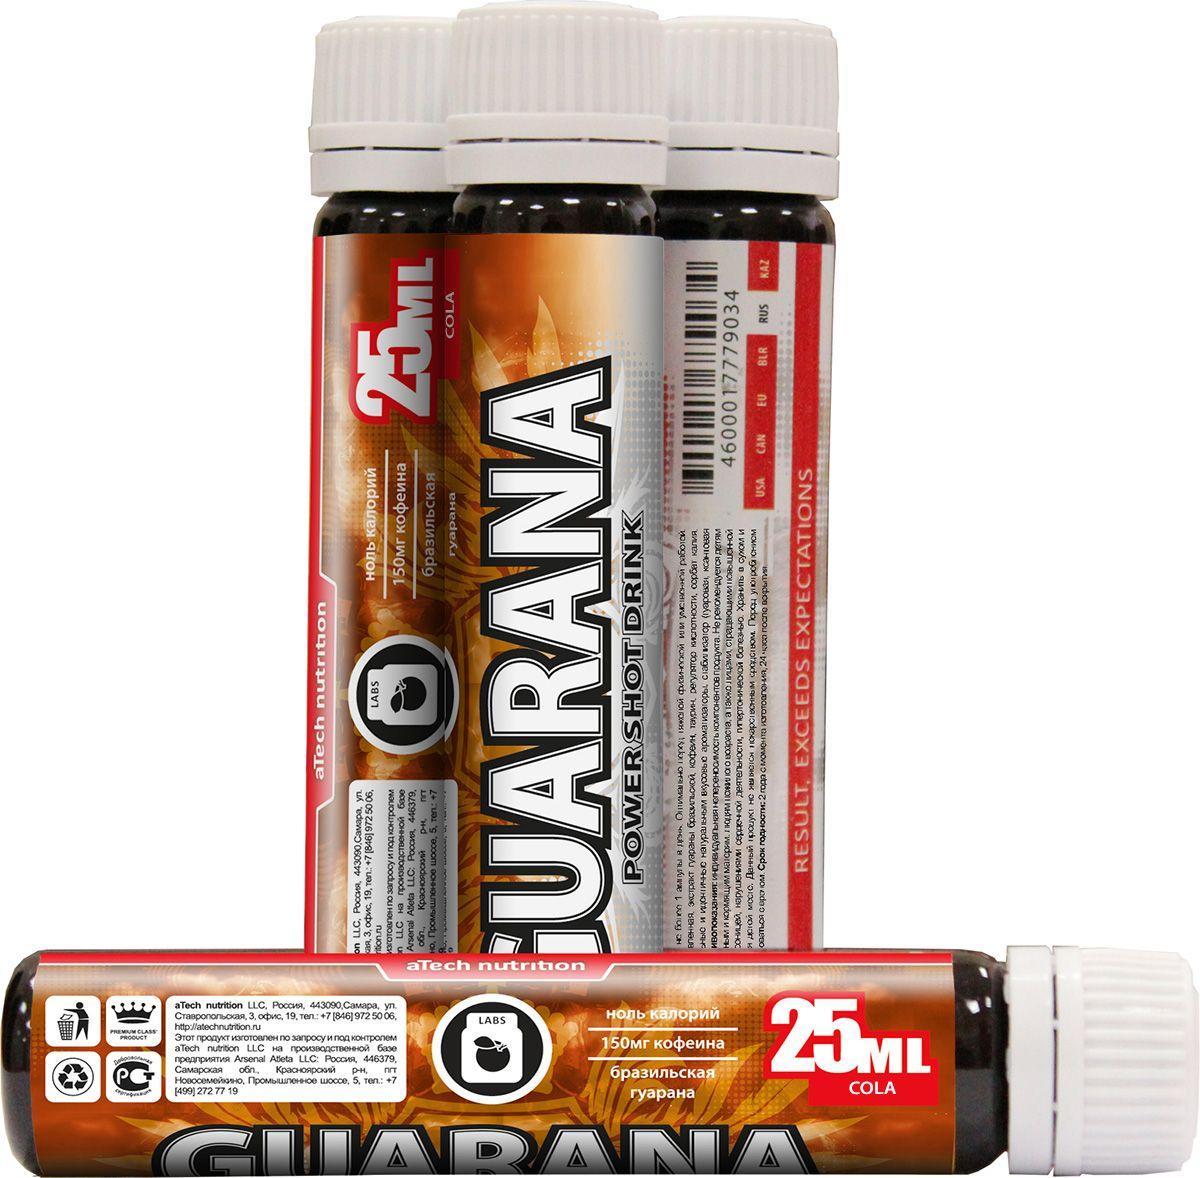 "Энергетический напиток aTech Nutrition ""Guarana Power Shot Drink"", кола, 25 мл"